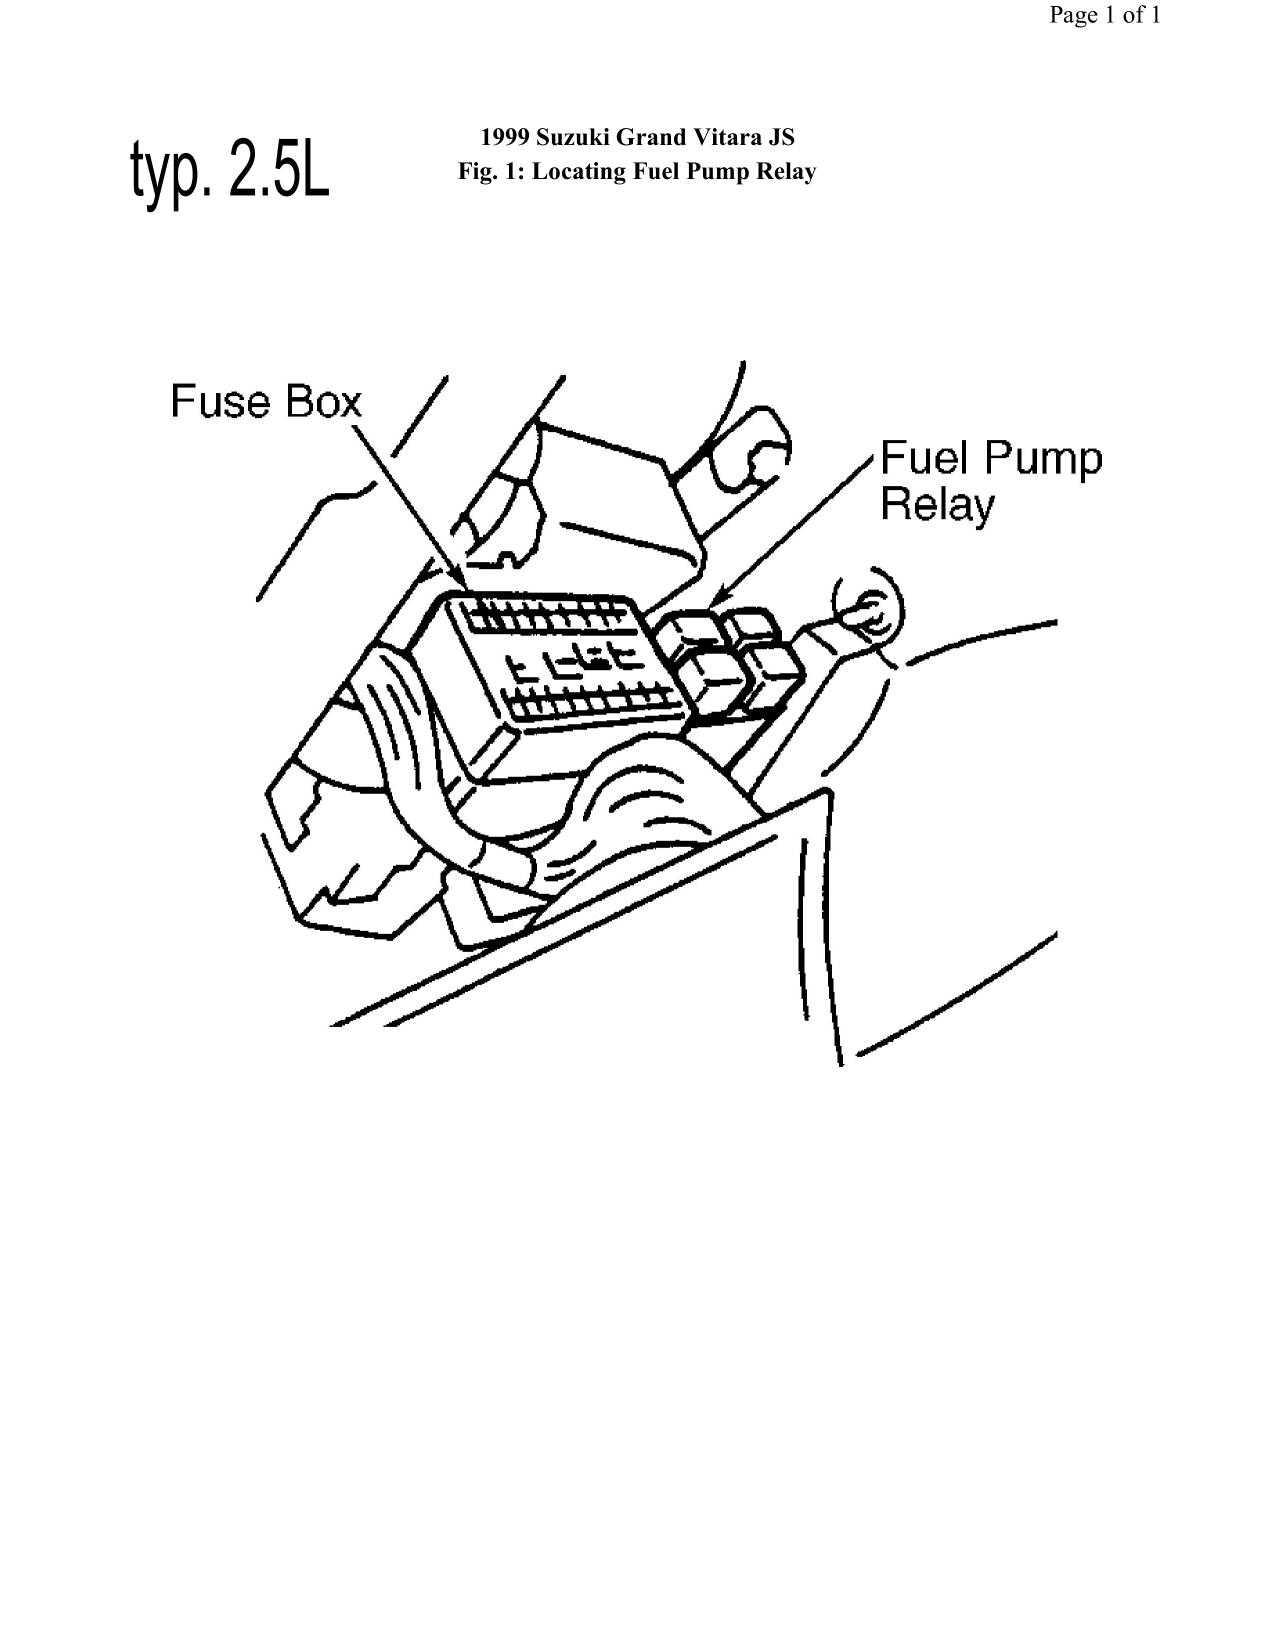 1999 suzuki grand vitara fuse box